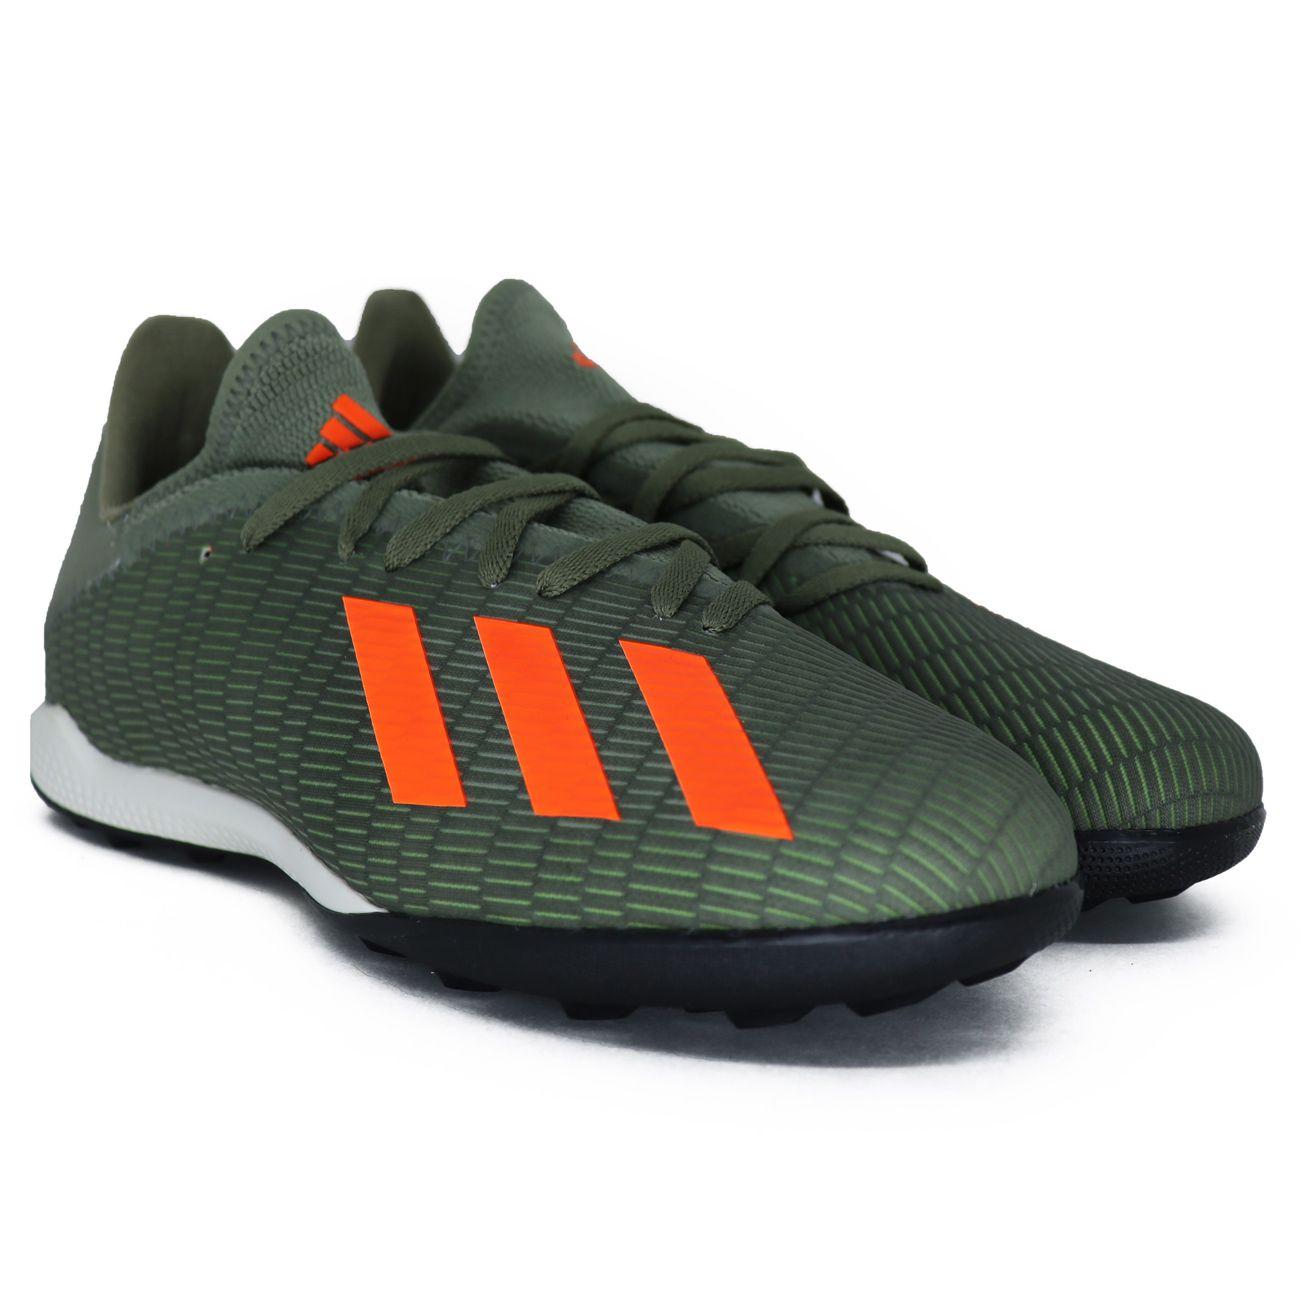 Chuteira Adidas X 19.3 Society